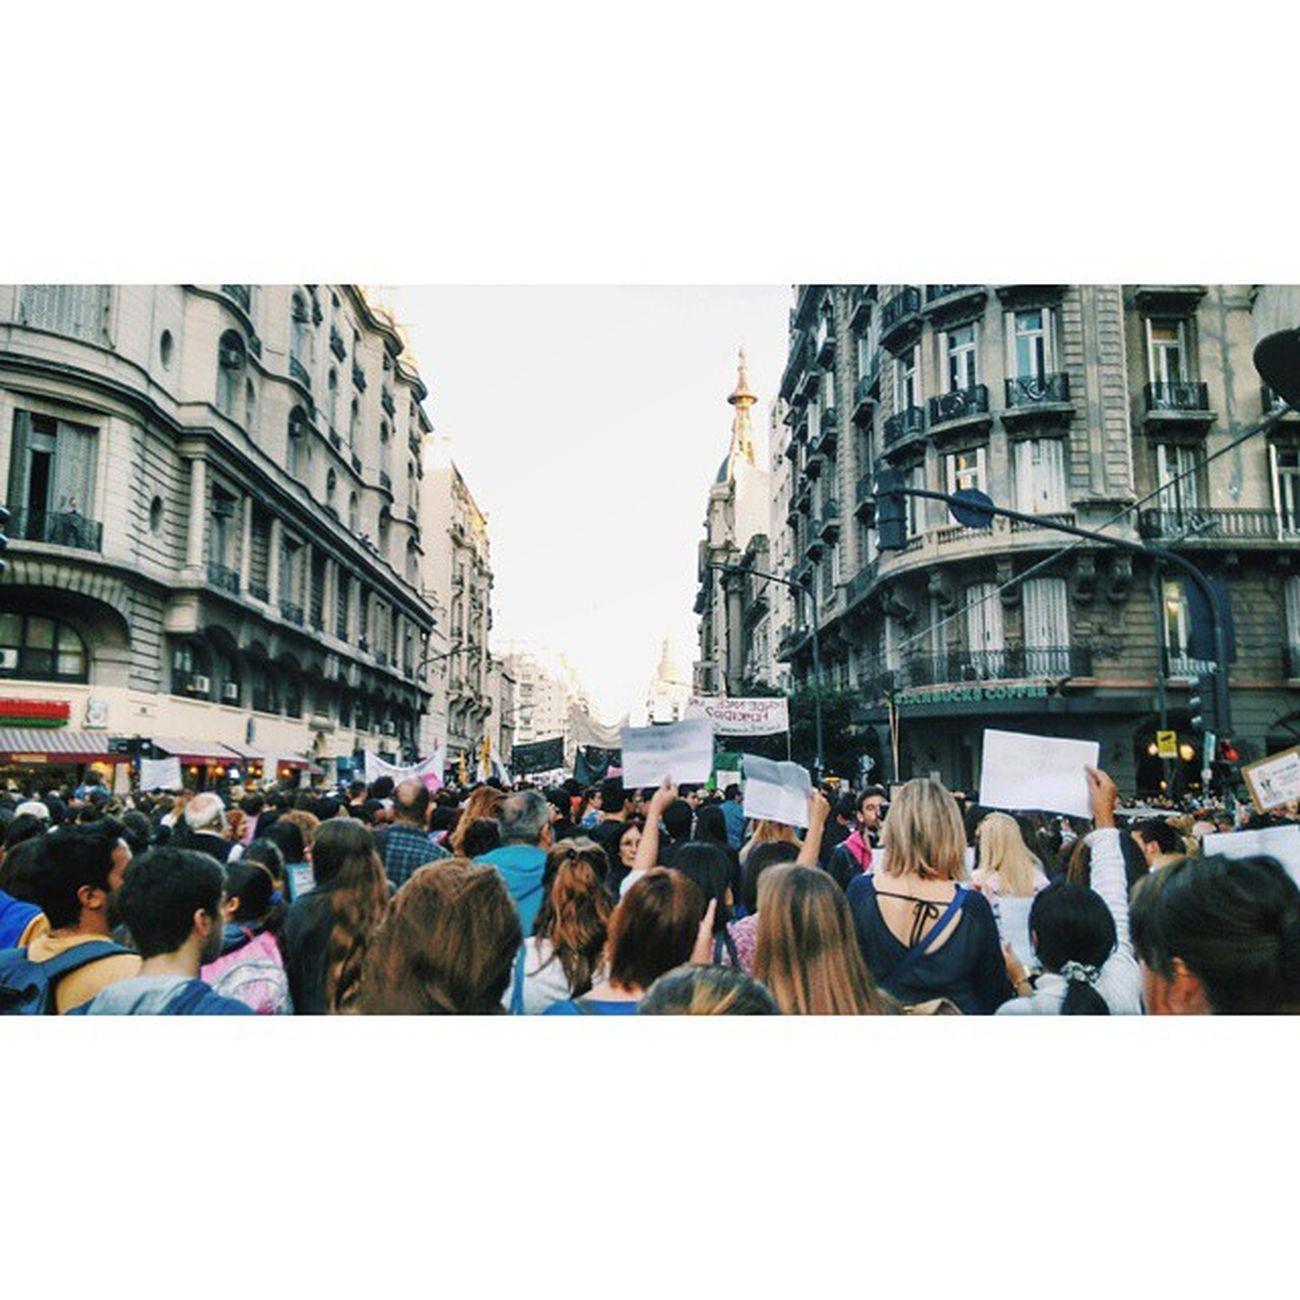 ✔✔✔ BastaDeViolencia Niunamenos GenderEquality Feminism 🔜🔜 (protest against gender-based violence/abuse)